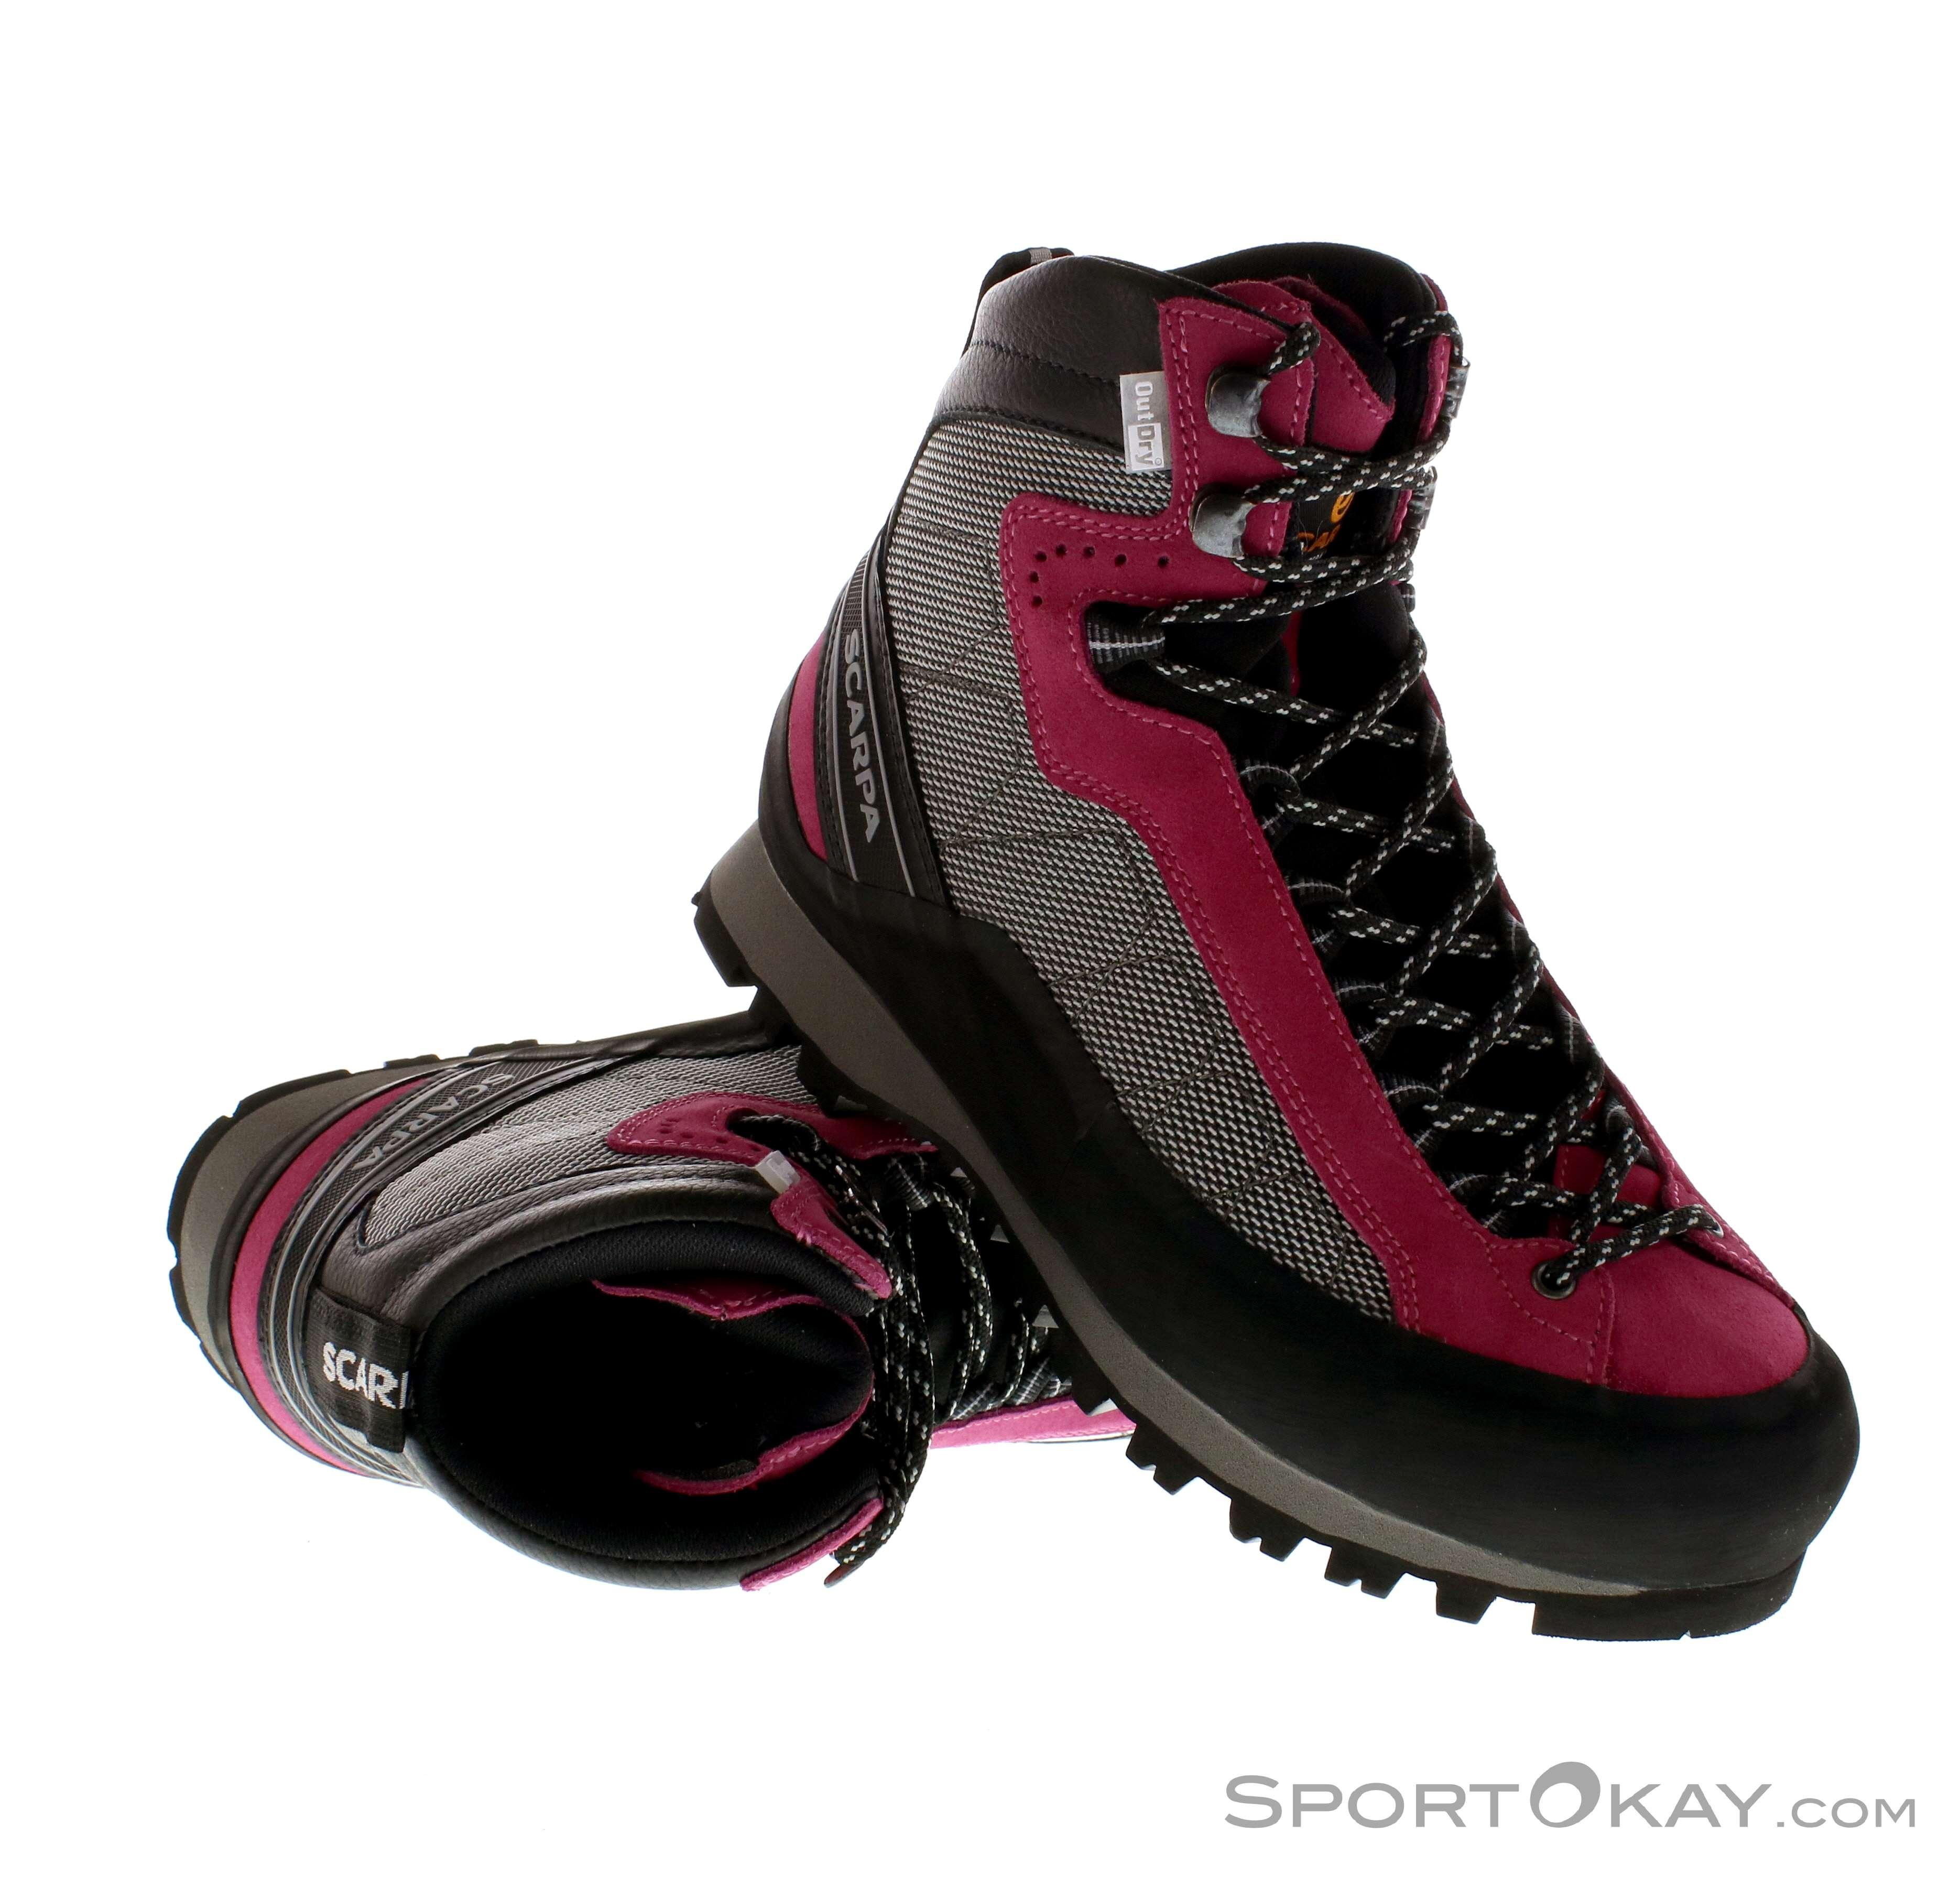 Scarpa Marmolada Trek Damen Bergschuhe, Scarpa, Pink-Rosa, , Damen, 0028-10064, 5637486825, 8025228688306, N1-01.jpg